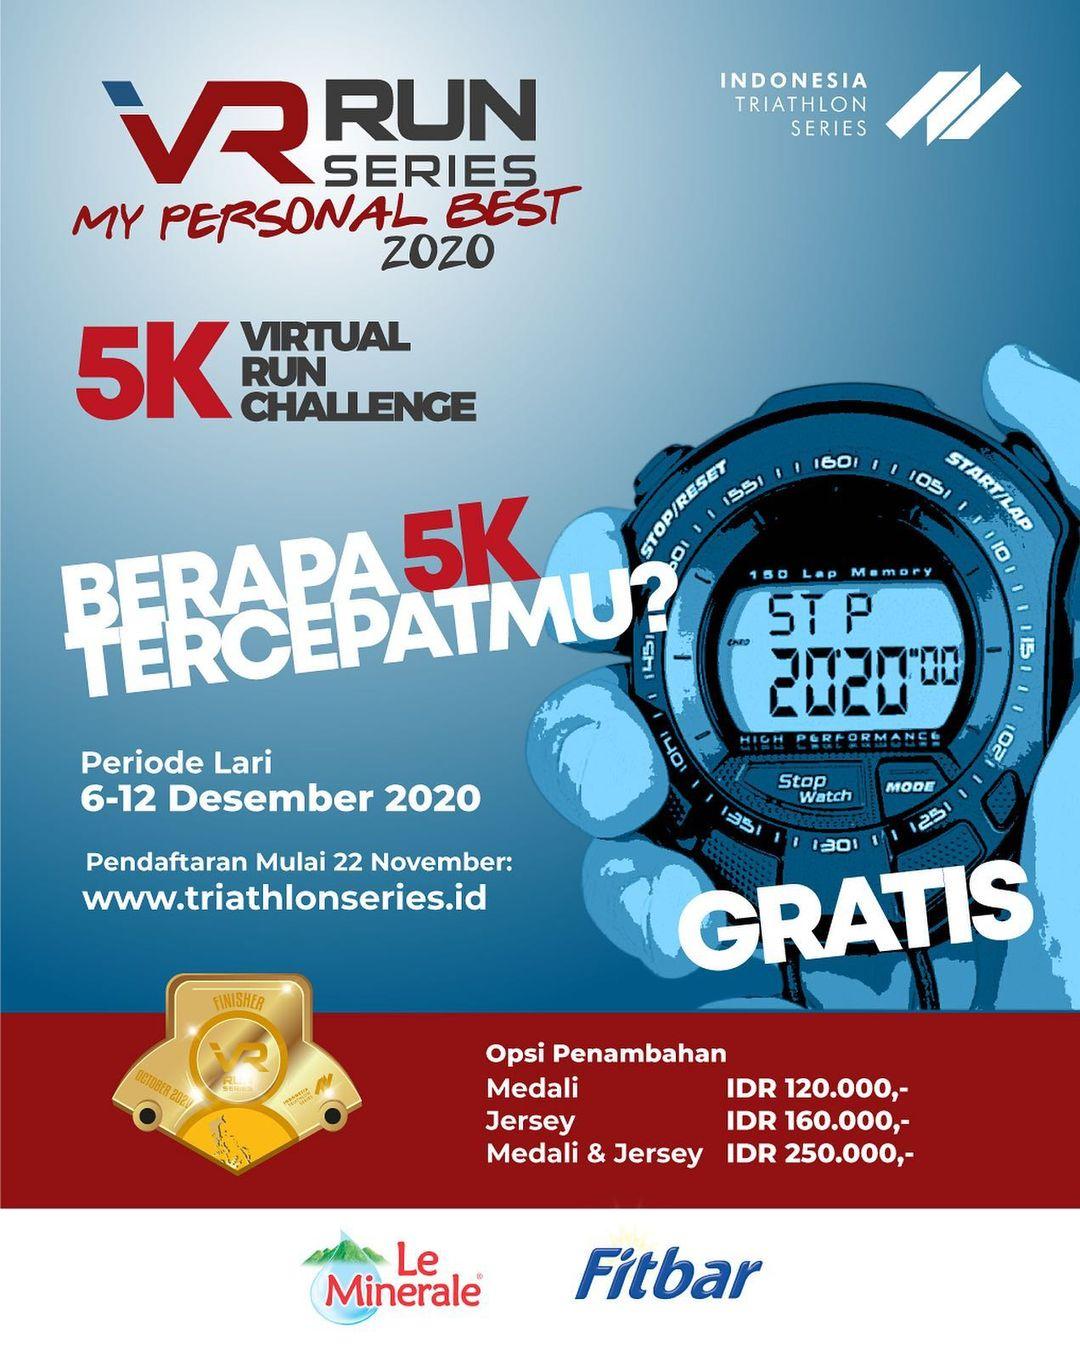 Indonesia Triathlon Series - VR Run Series ∙ My Personal Best • 2020